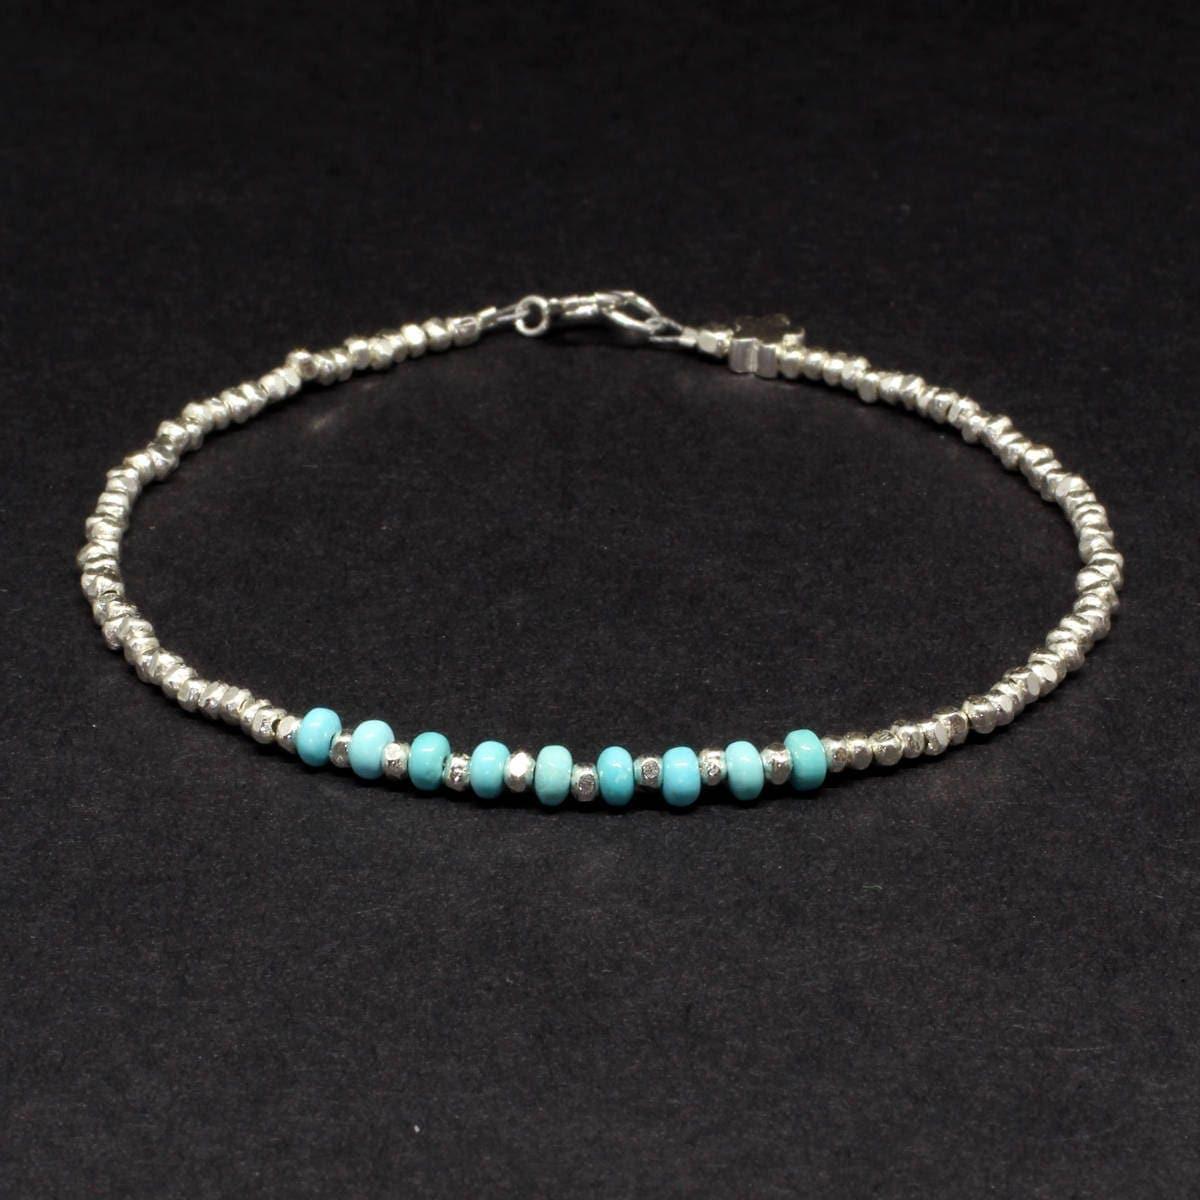 Sleeping Beauty Turquoise braceletTurquoise braceletBlue braceletTurquoiseSleeping BeautyDecember birthstoneKaren Hill Tribe Silver